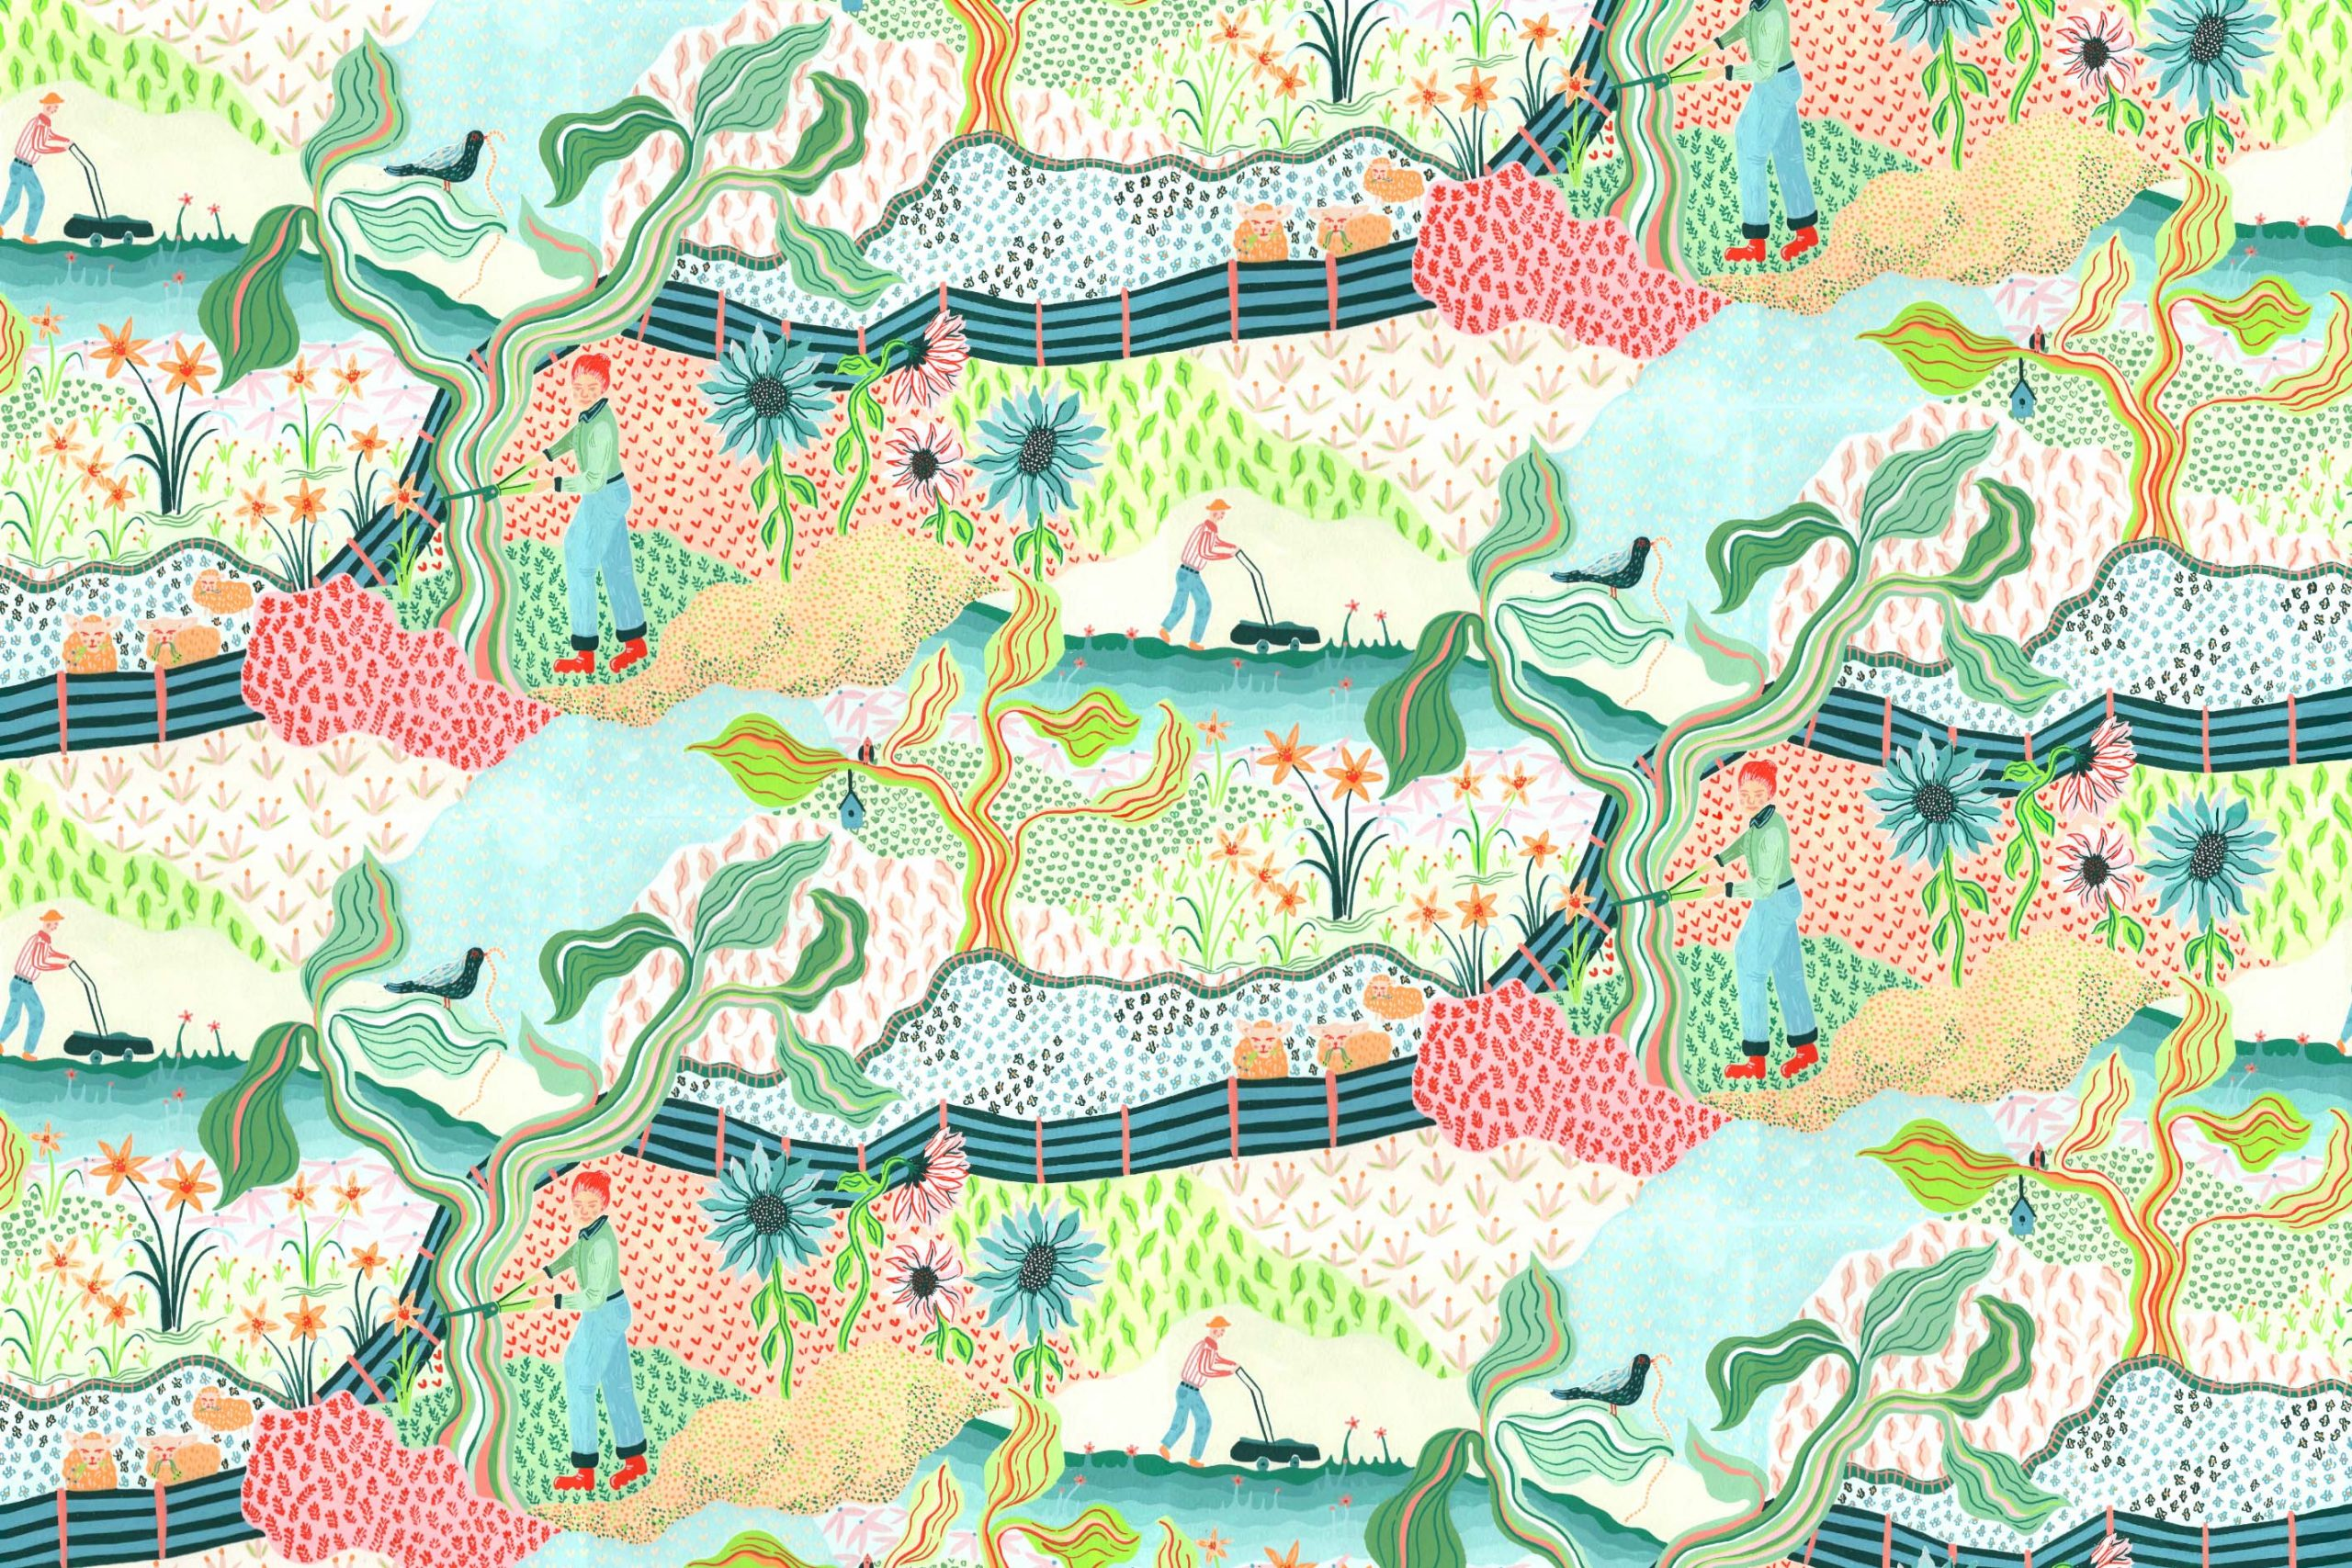 Sophie Forster Euphoric Escapism Textile Design 2.jpg